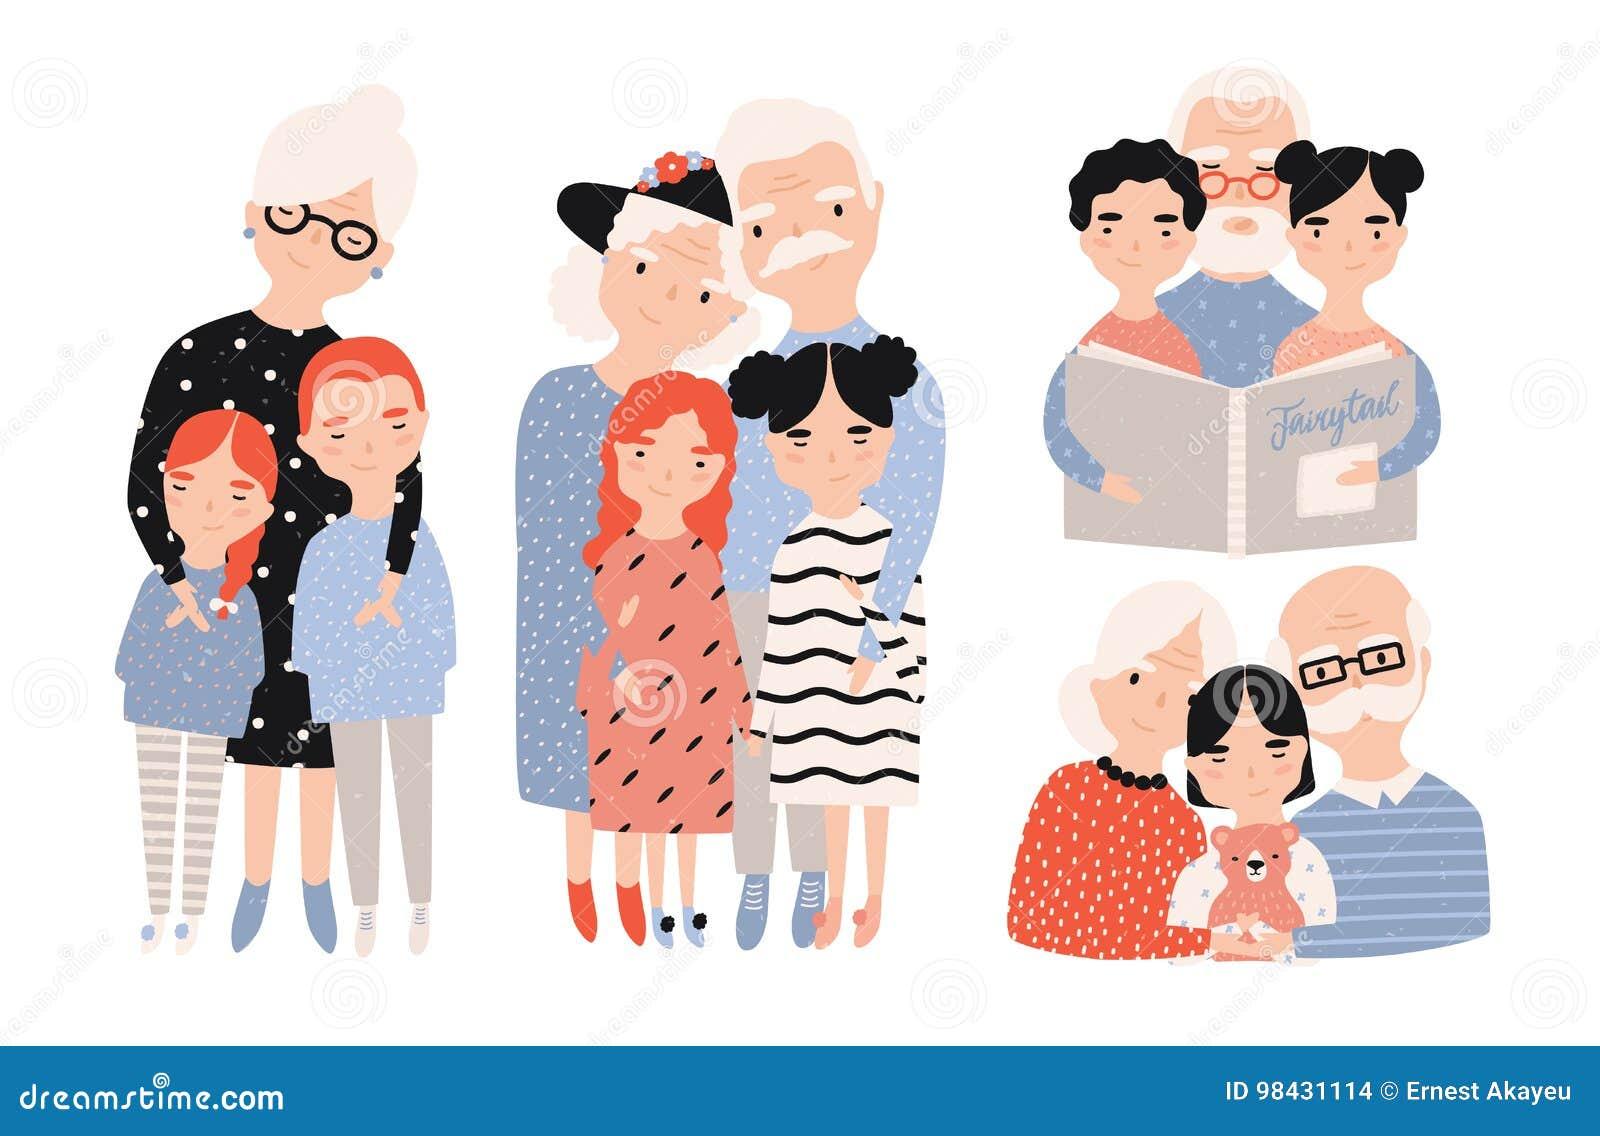 Happy grandparents with grandchildren set. Hand drawn cartoon illustrations collection.